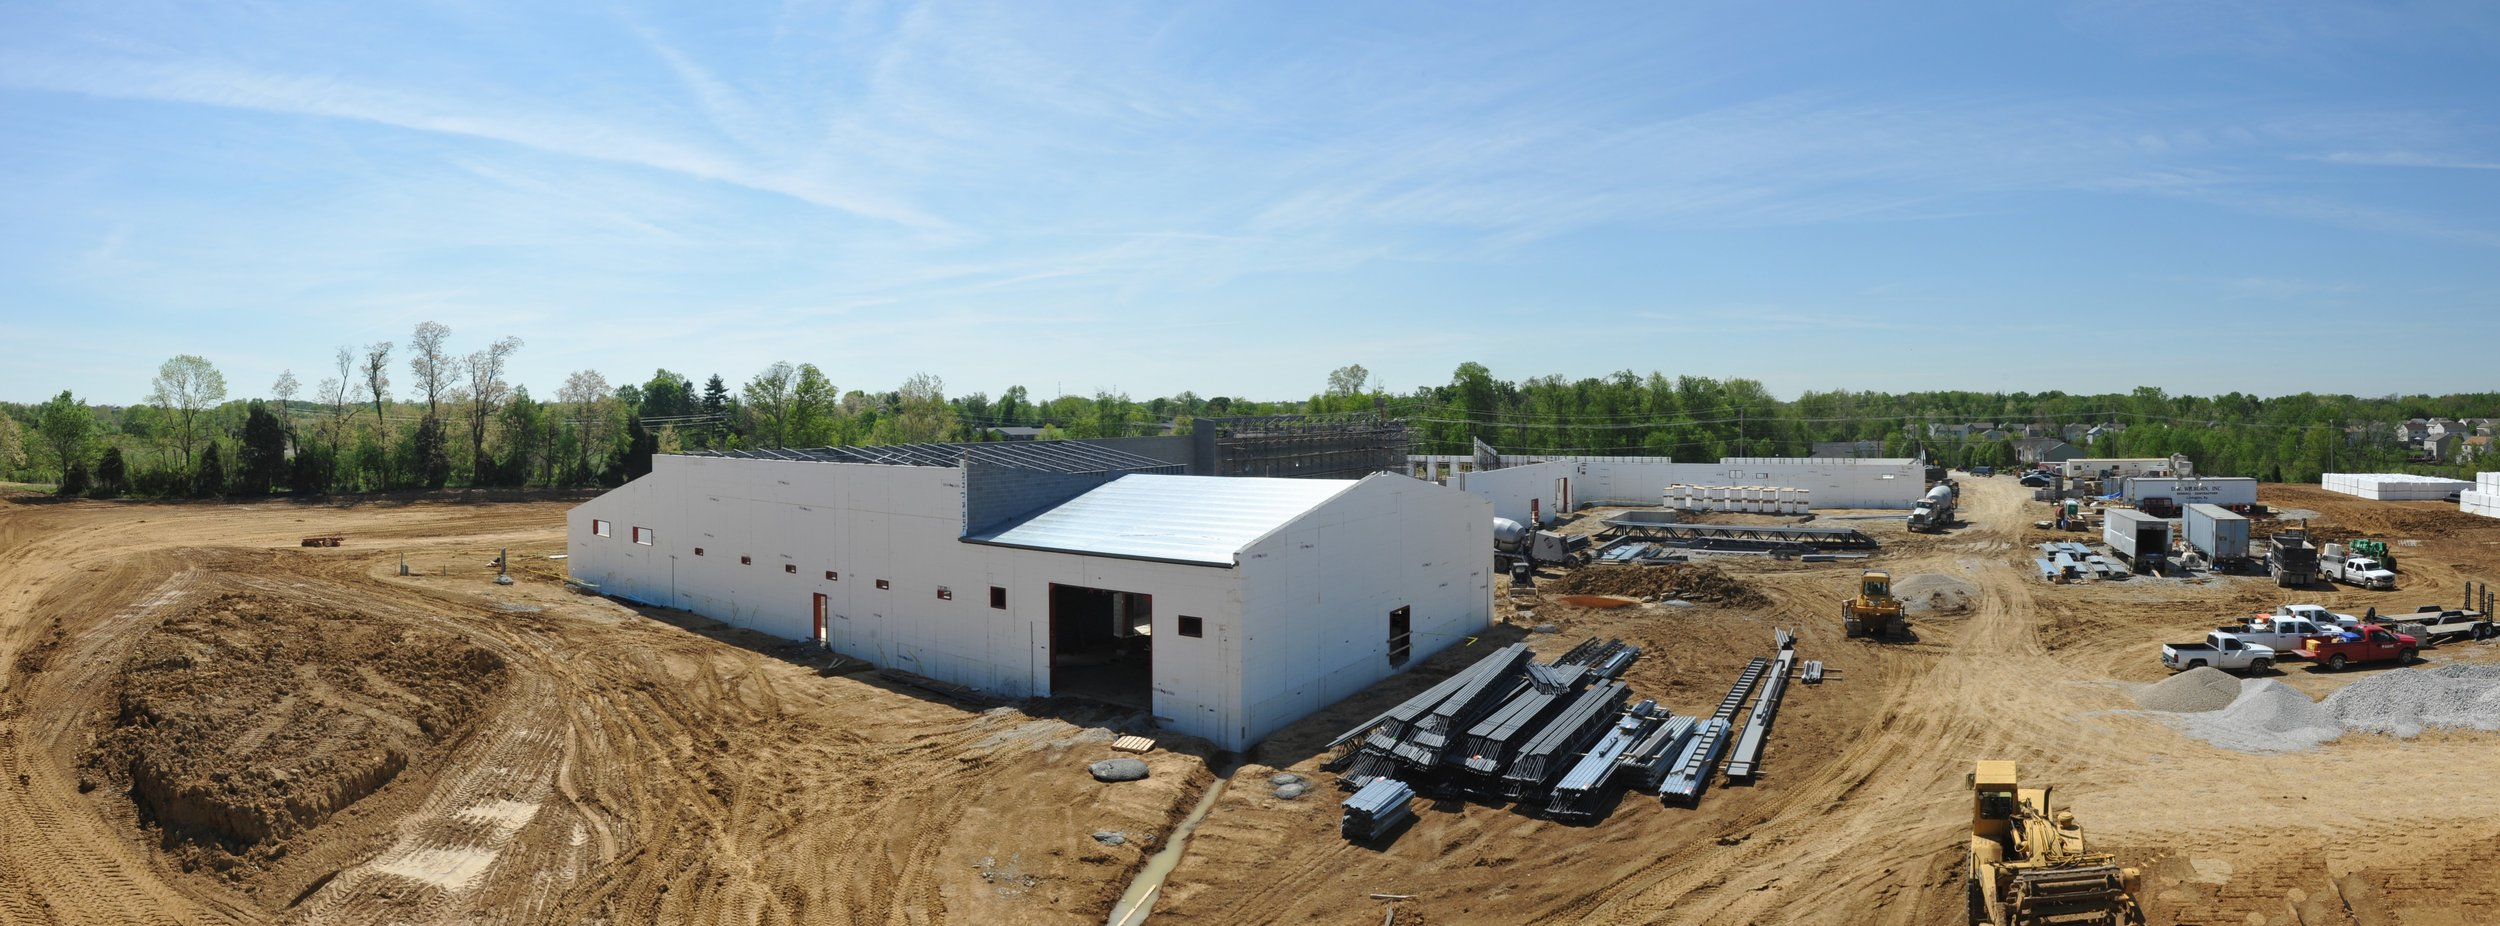 Burlington-Readiness-Center-7.jpg